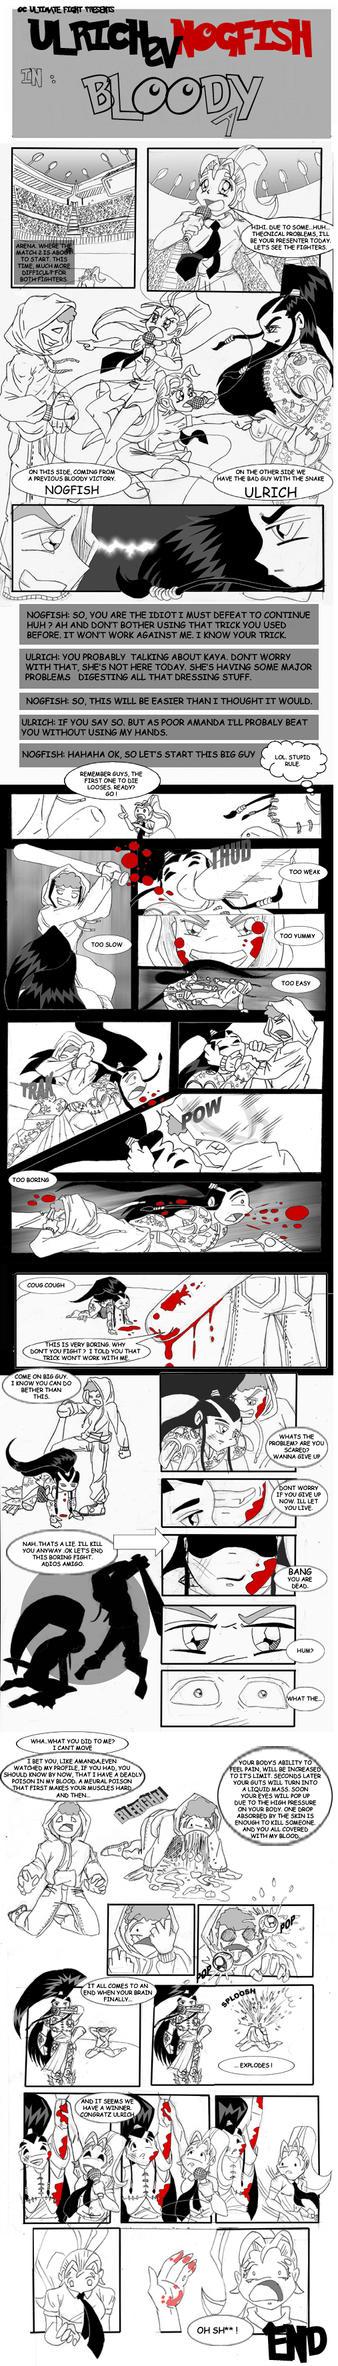 OC Fighting -Ulrich vs Nogfish by Mr-Roach